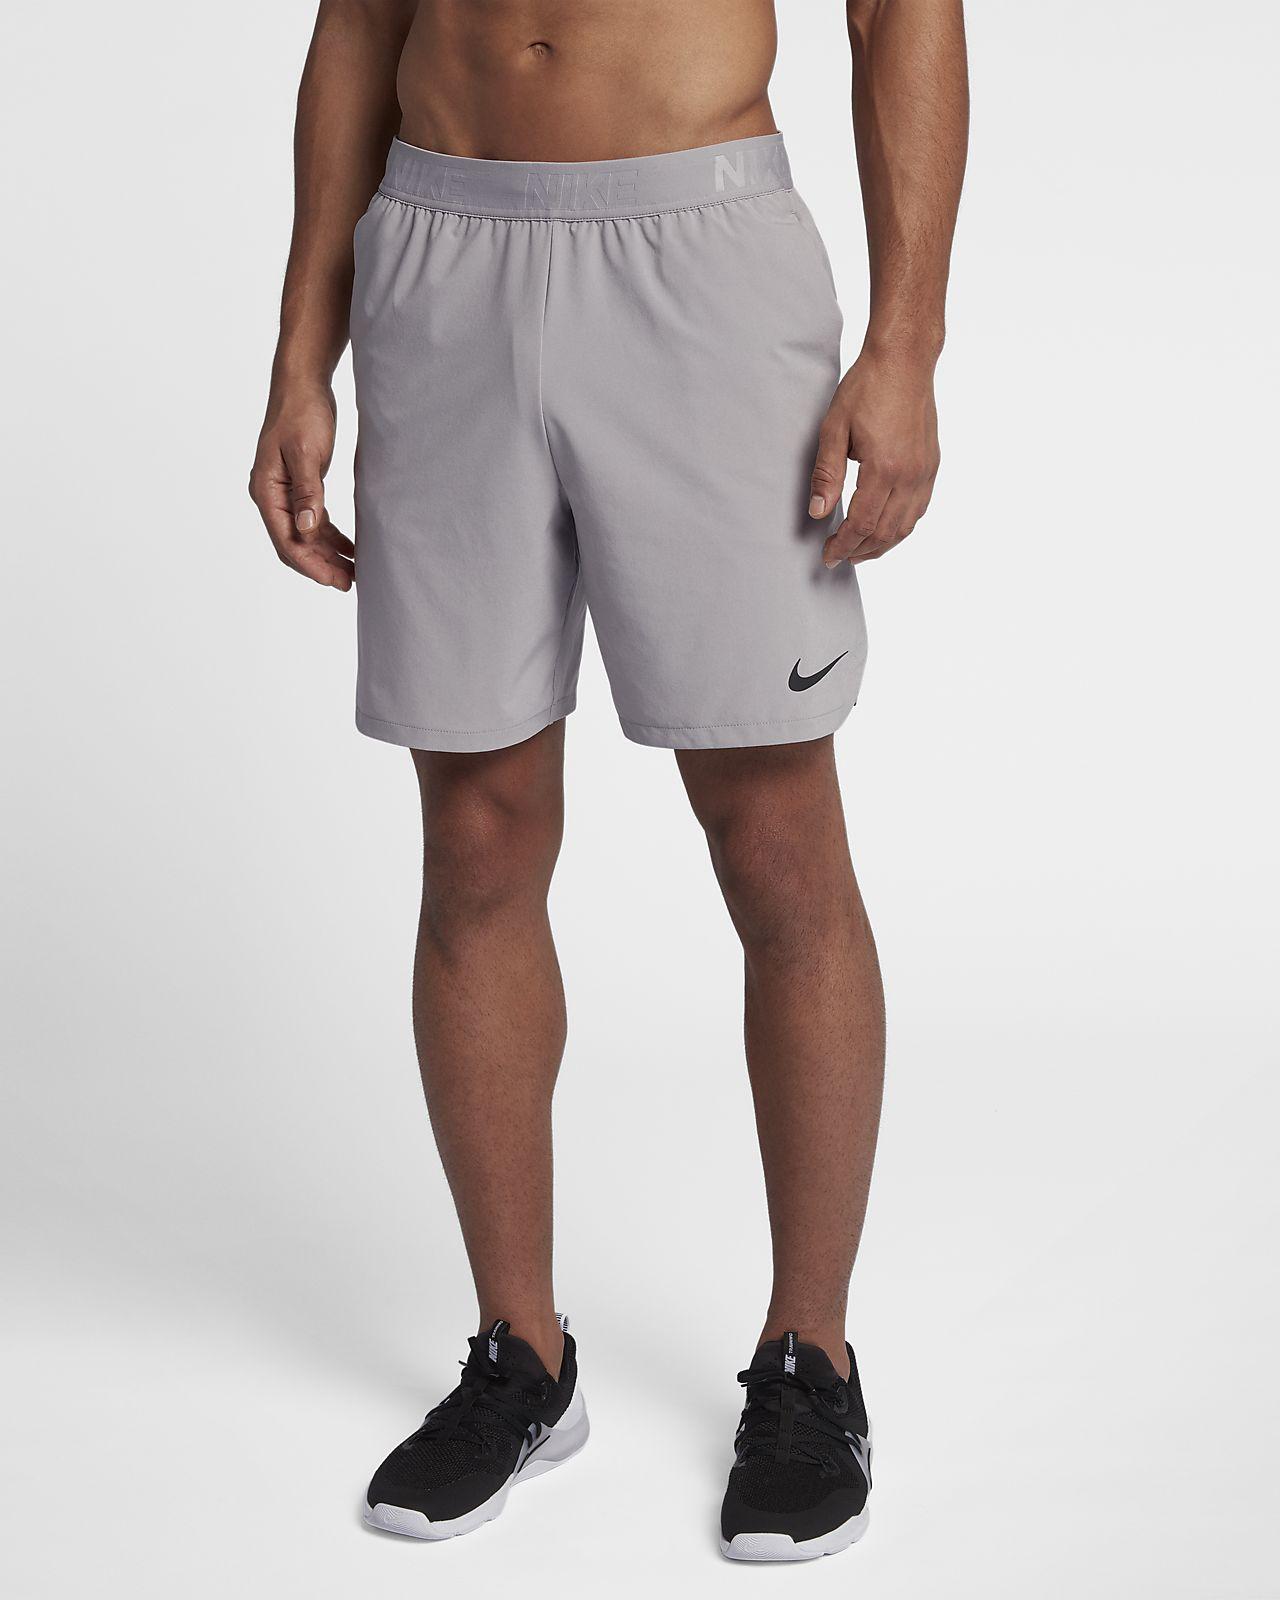 6163bfea9 Nike Flex Pantalón corto de entrenamiento de 20,5 cm - Hombre